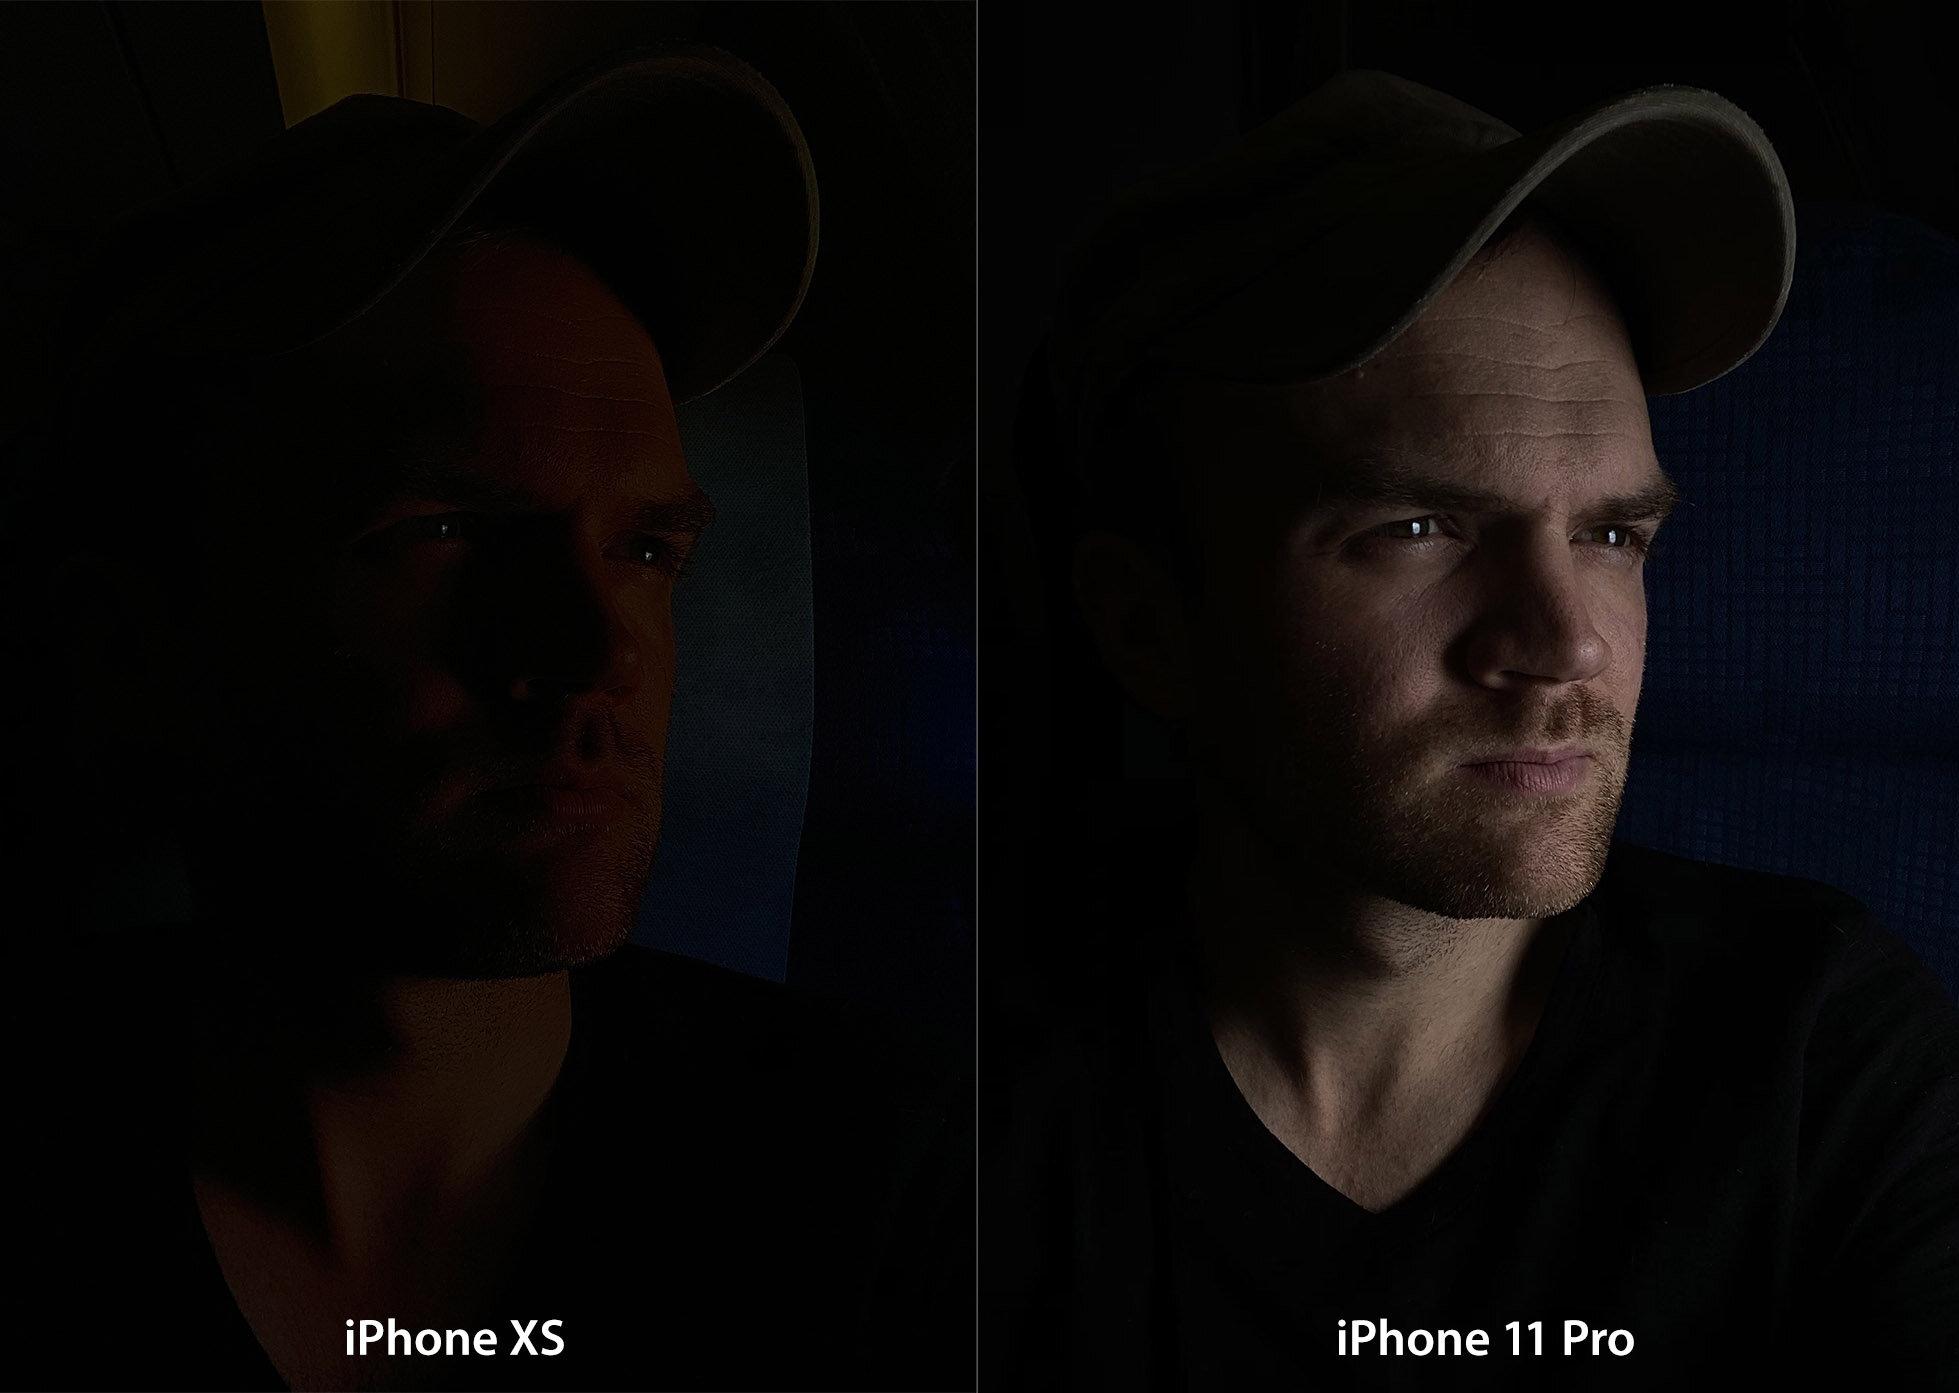 Testing iPhone 11 Pro's capability to preserve skin tones w/ underexposure.